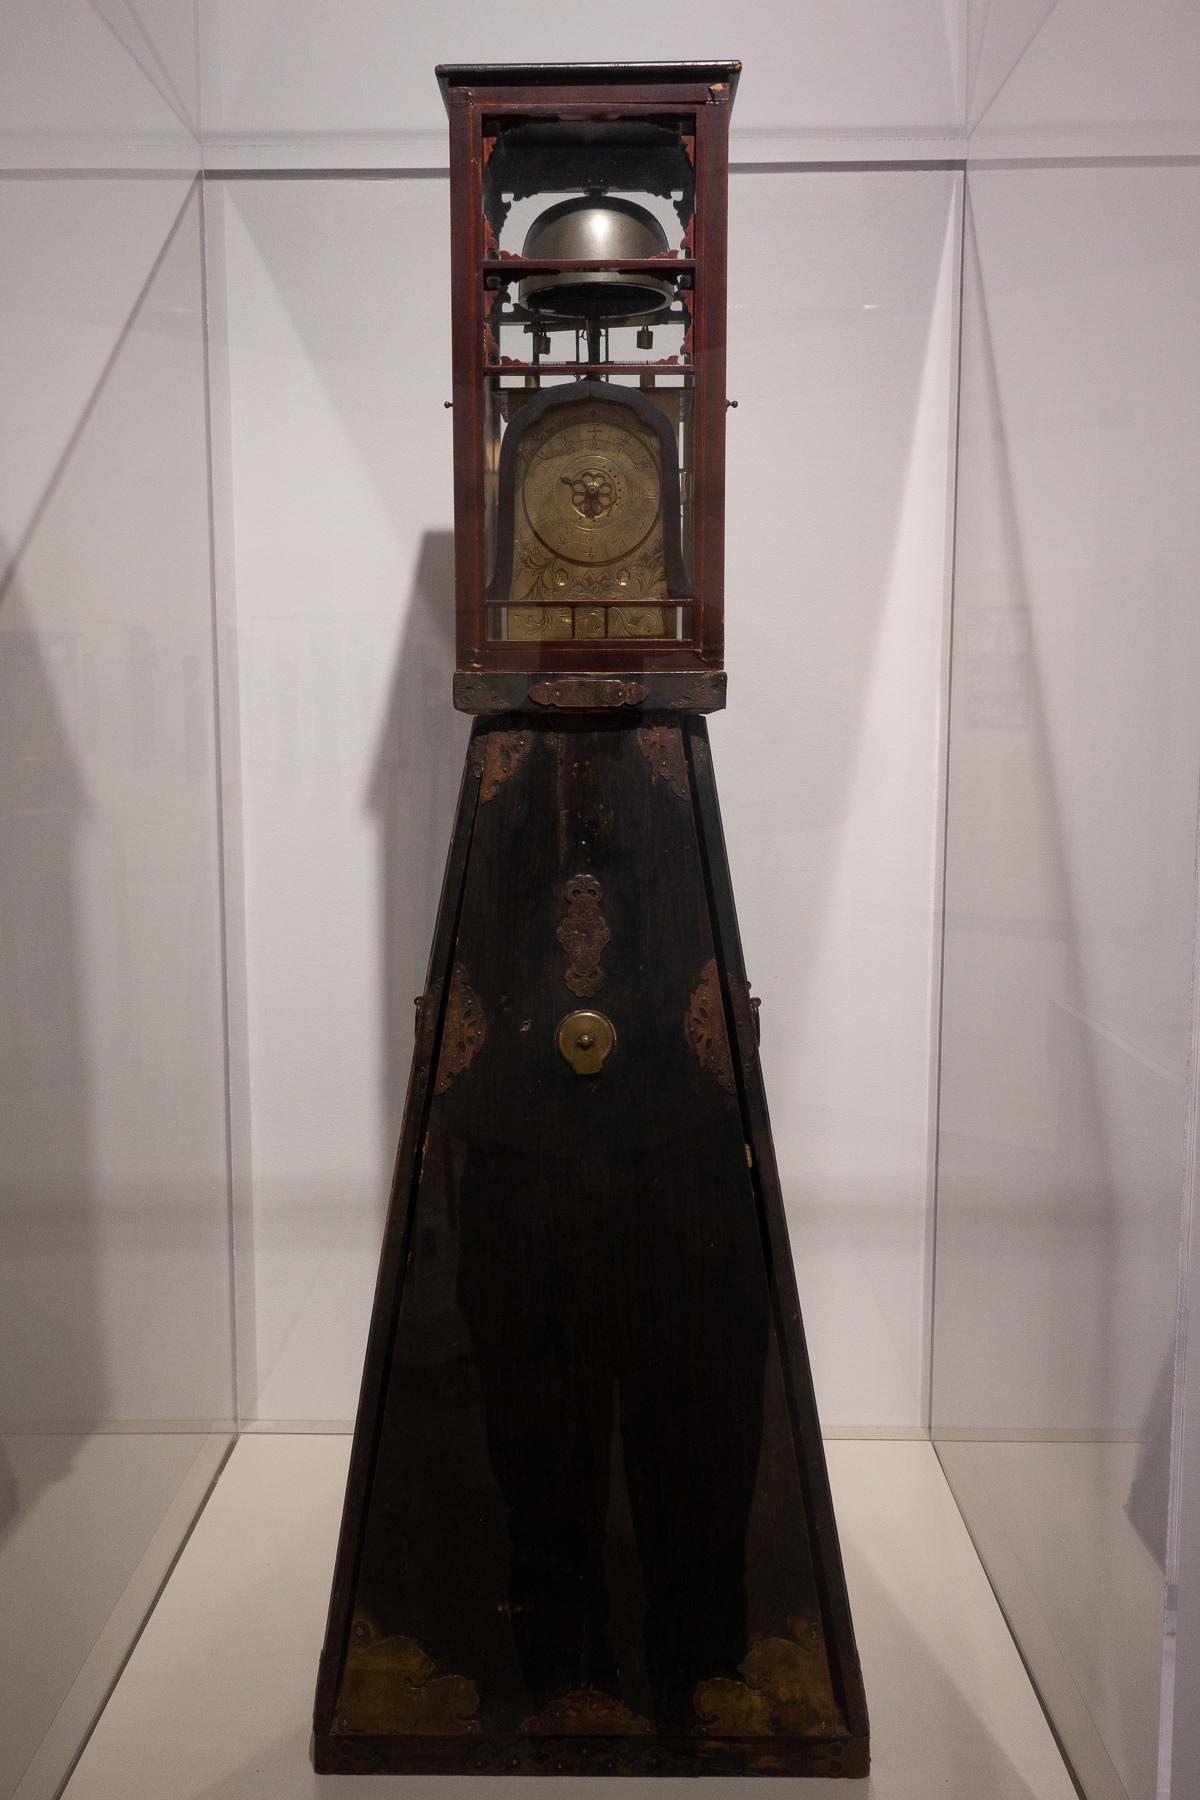 Wadokei Lantern Clock